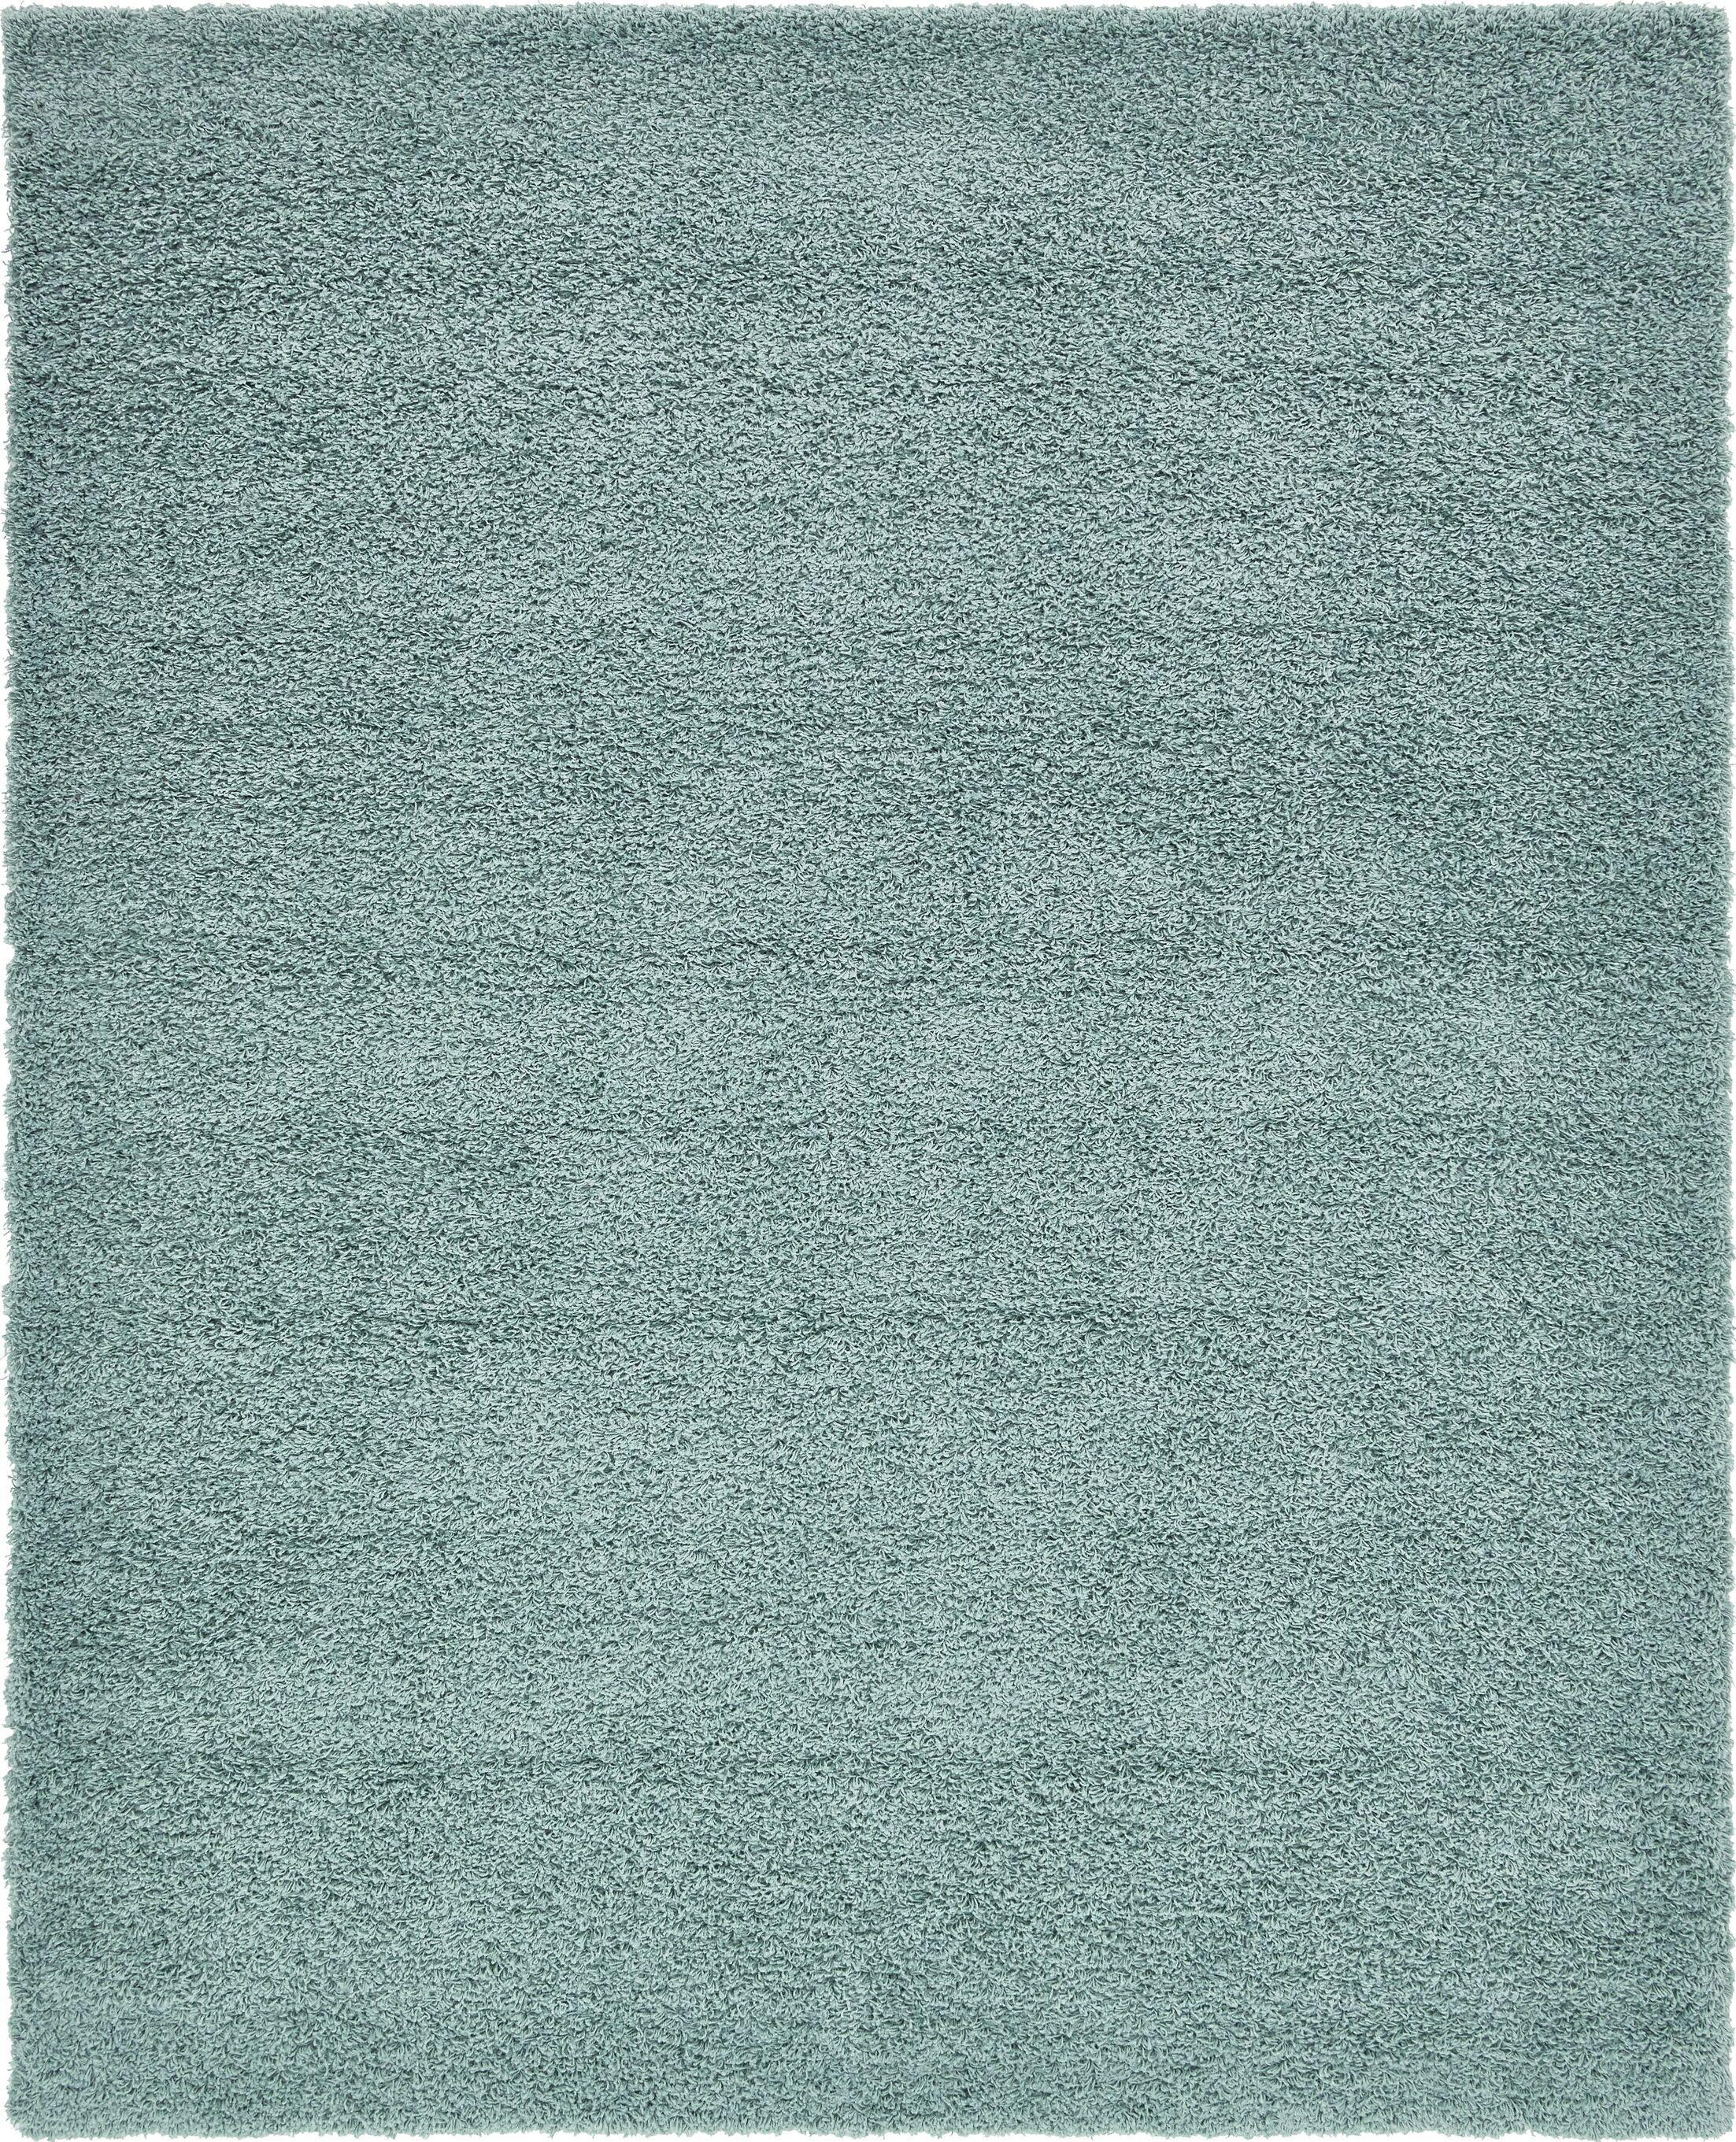 Lilah Light Blue Area Rug Rug Size: Rectangle 8' x 10'